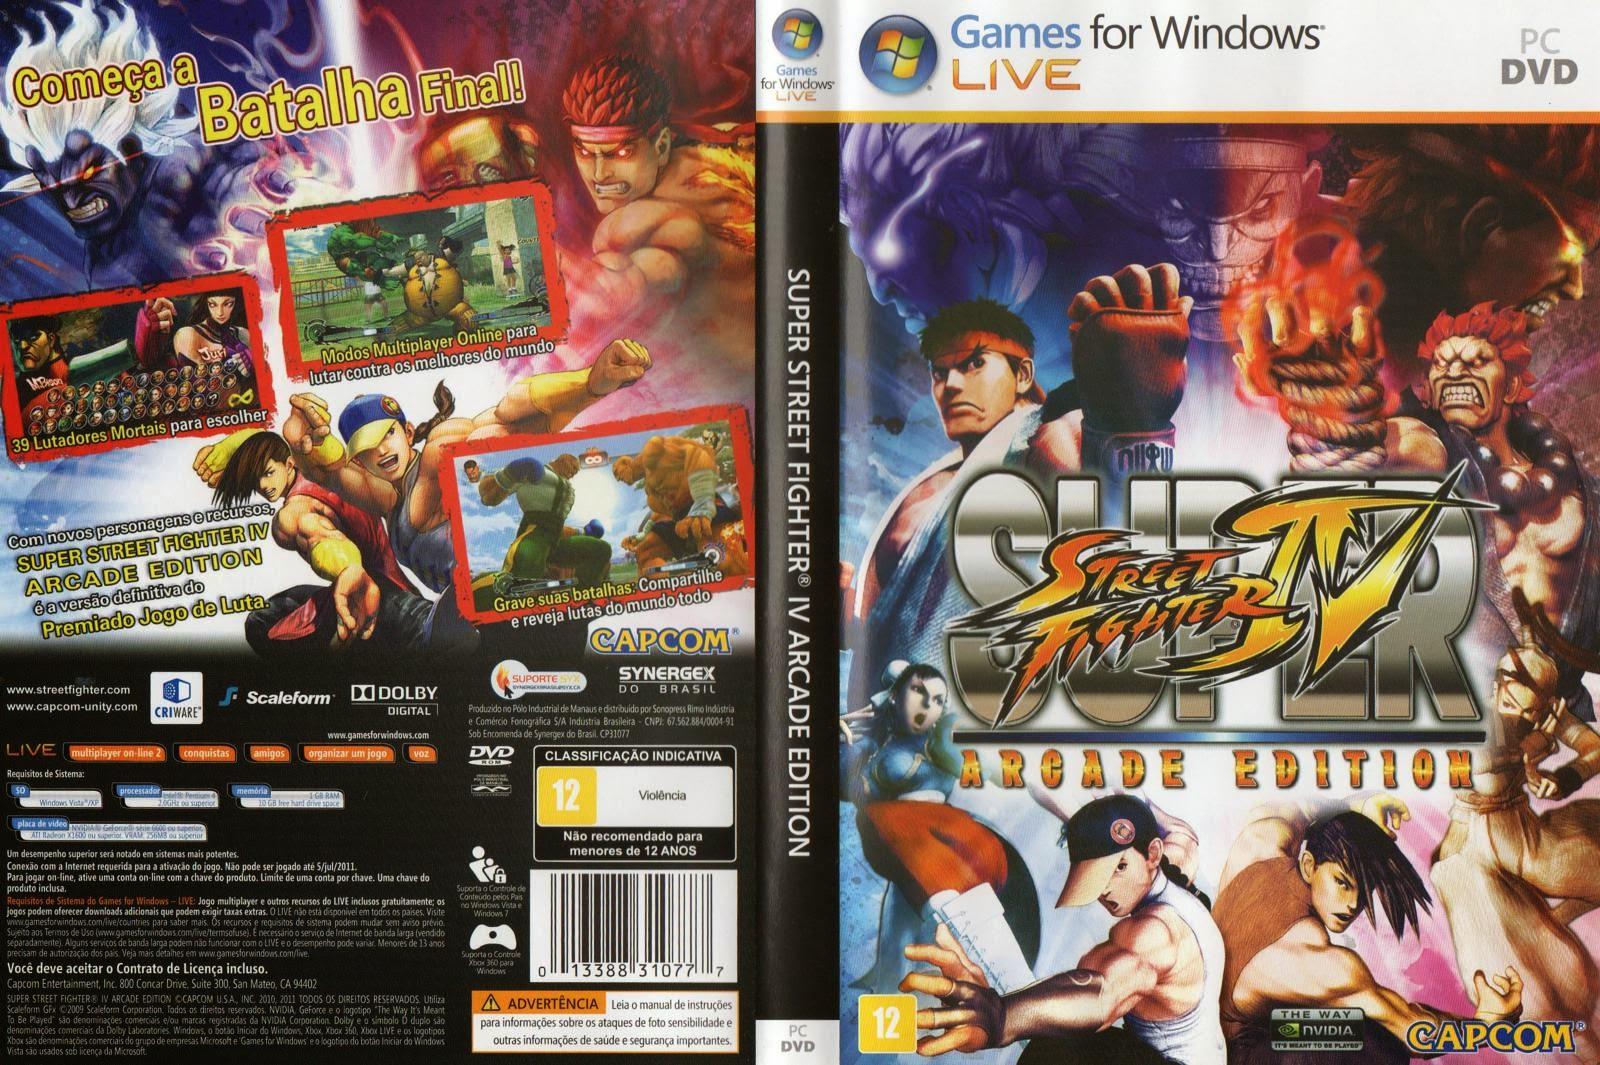 Super Street Fighter IV Arcade Edition PC DVD Capa